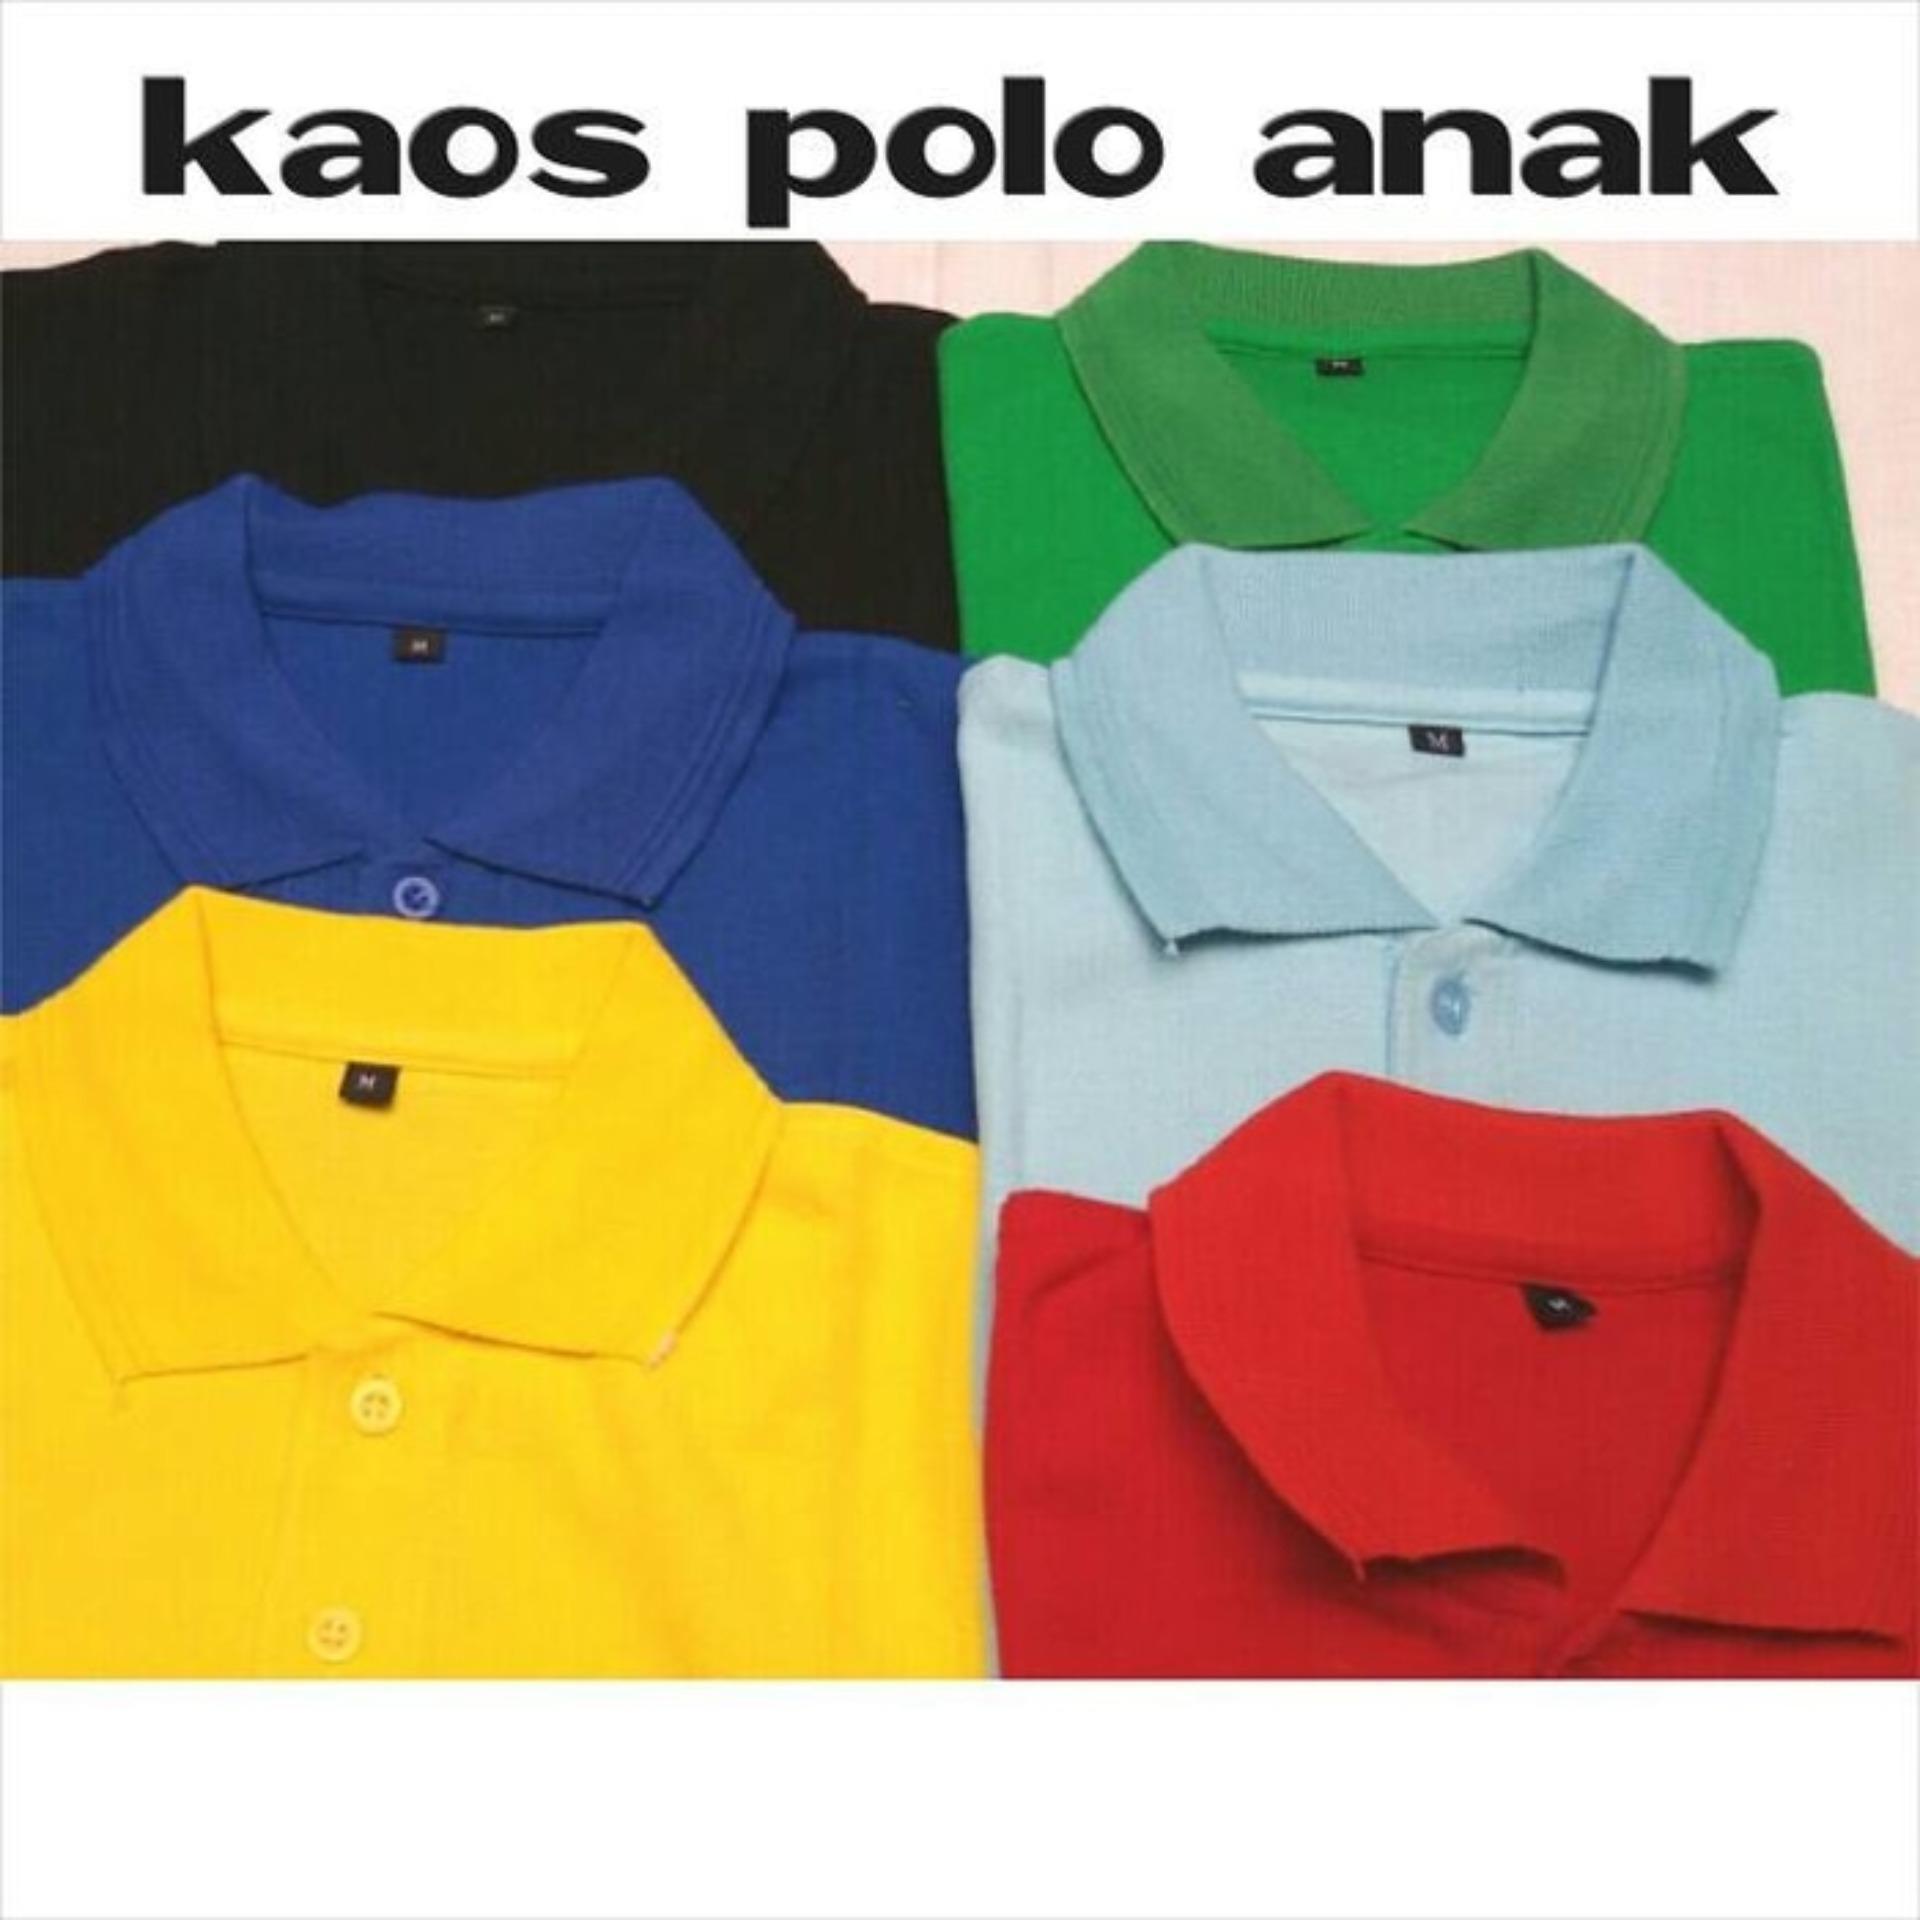 POLO SHIRT Pria Kaos Kerah FREDPERRY Must Muss Source · Jual polo shirt L batman logo